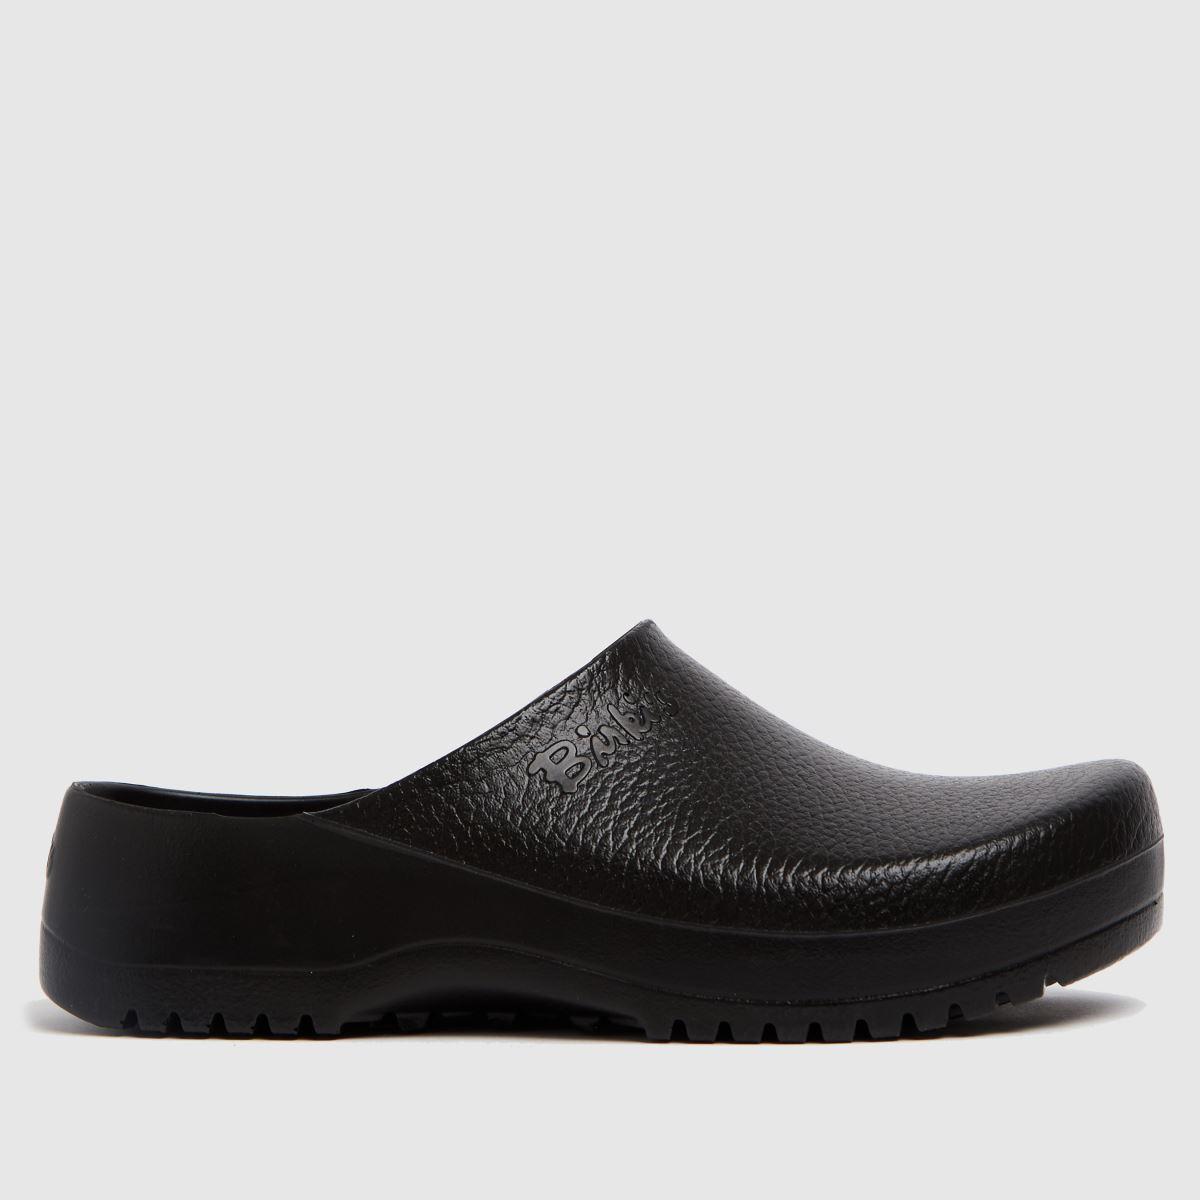 BIRKENSTOCK Black Super Birki Clog Sandals